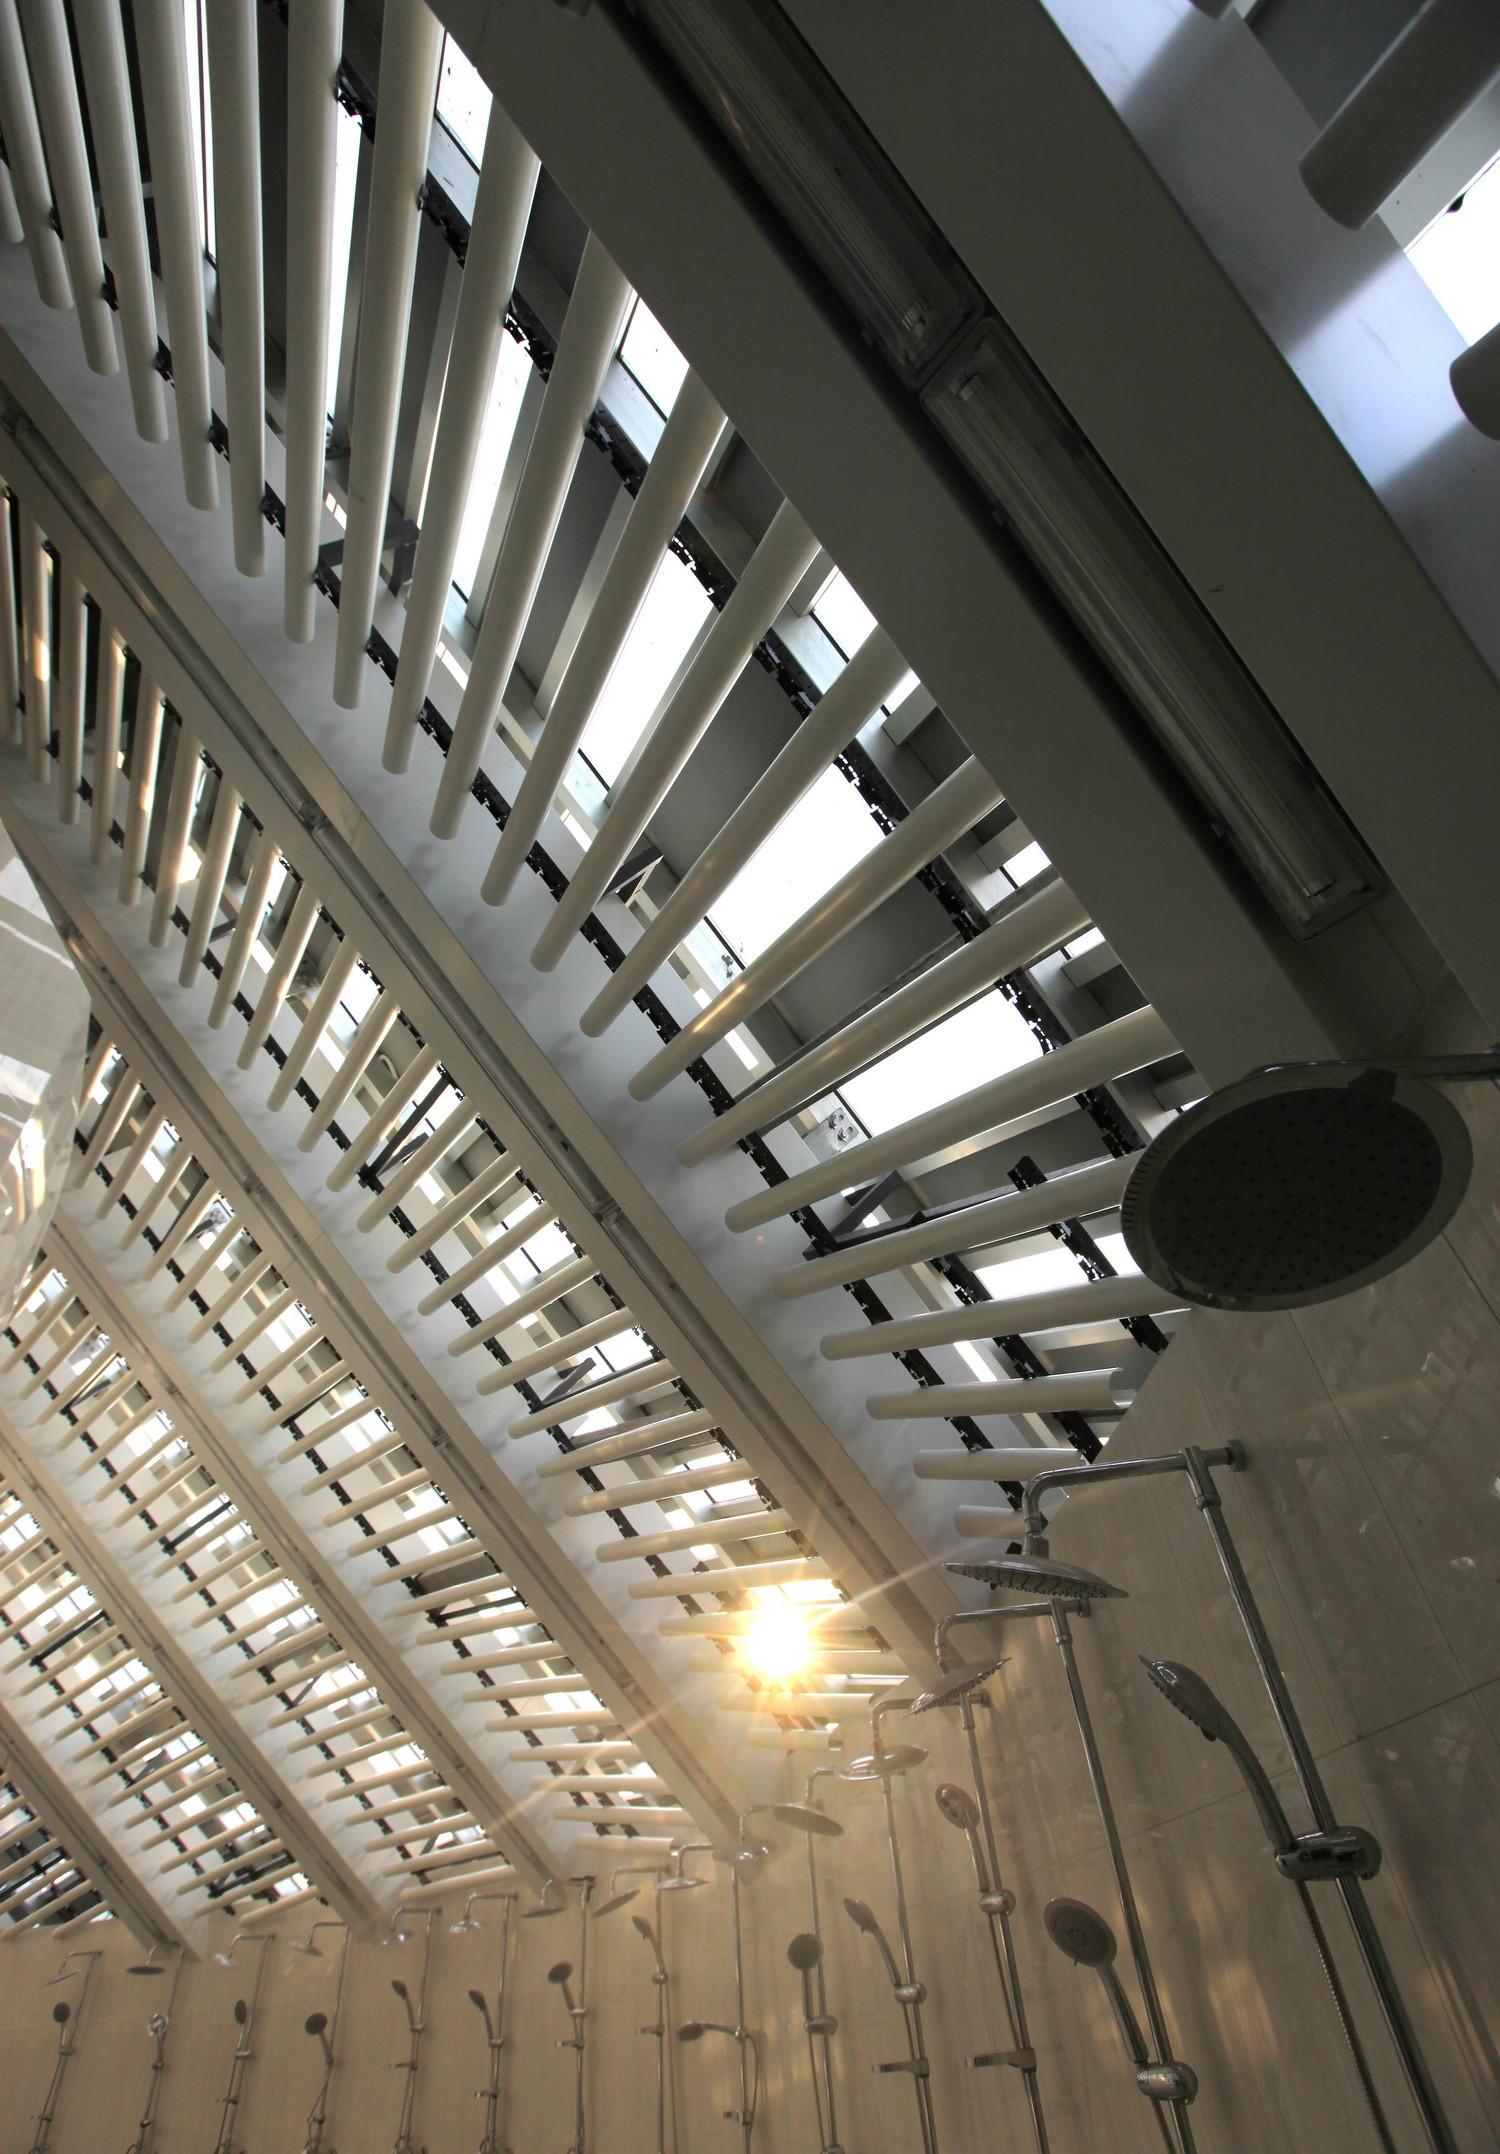 Galeria de Banheiro Público / HHD FUN Architects 17 #7F6D4C 1500 2154